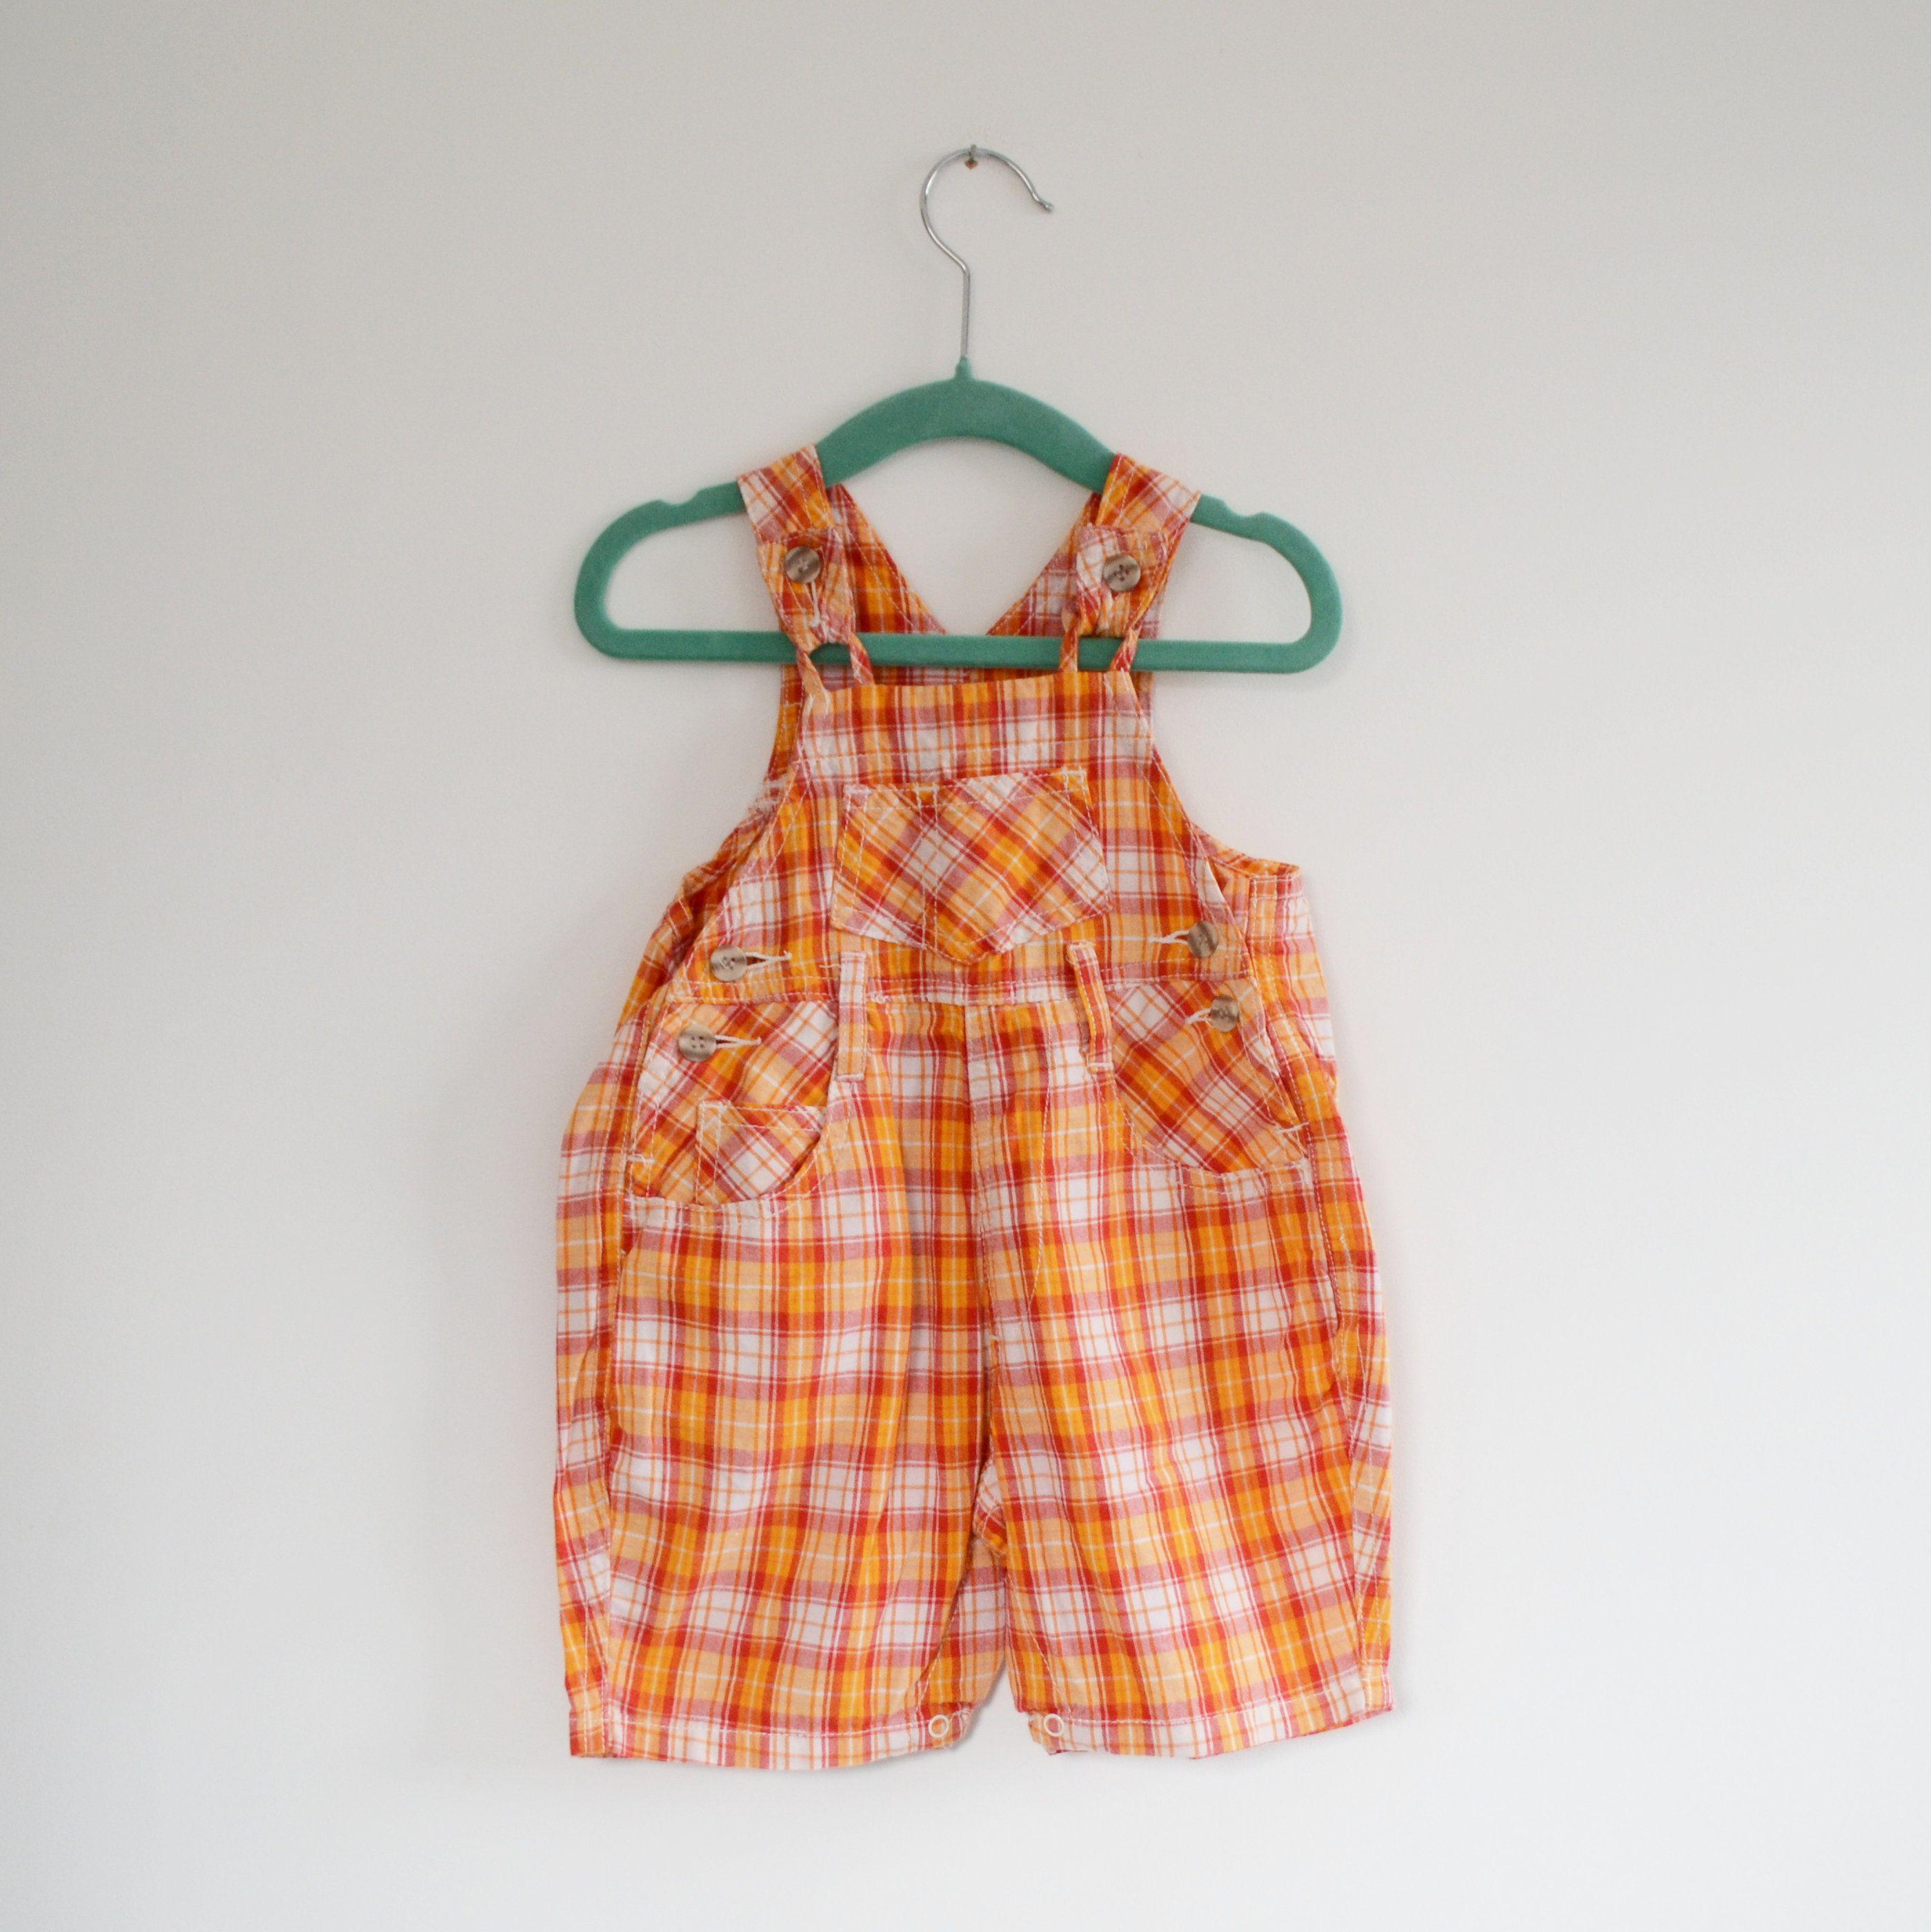 Vintage Orange Dungaree Shorts Age 9 12 Months Vintage Tesco